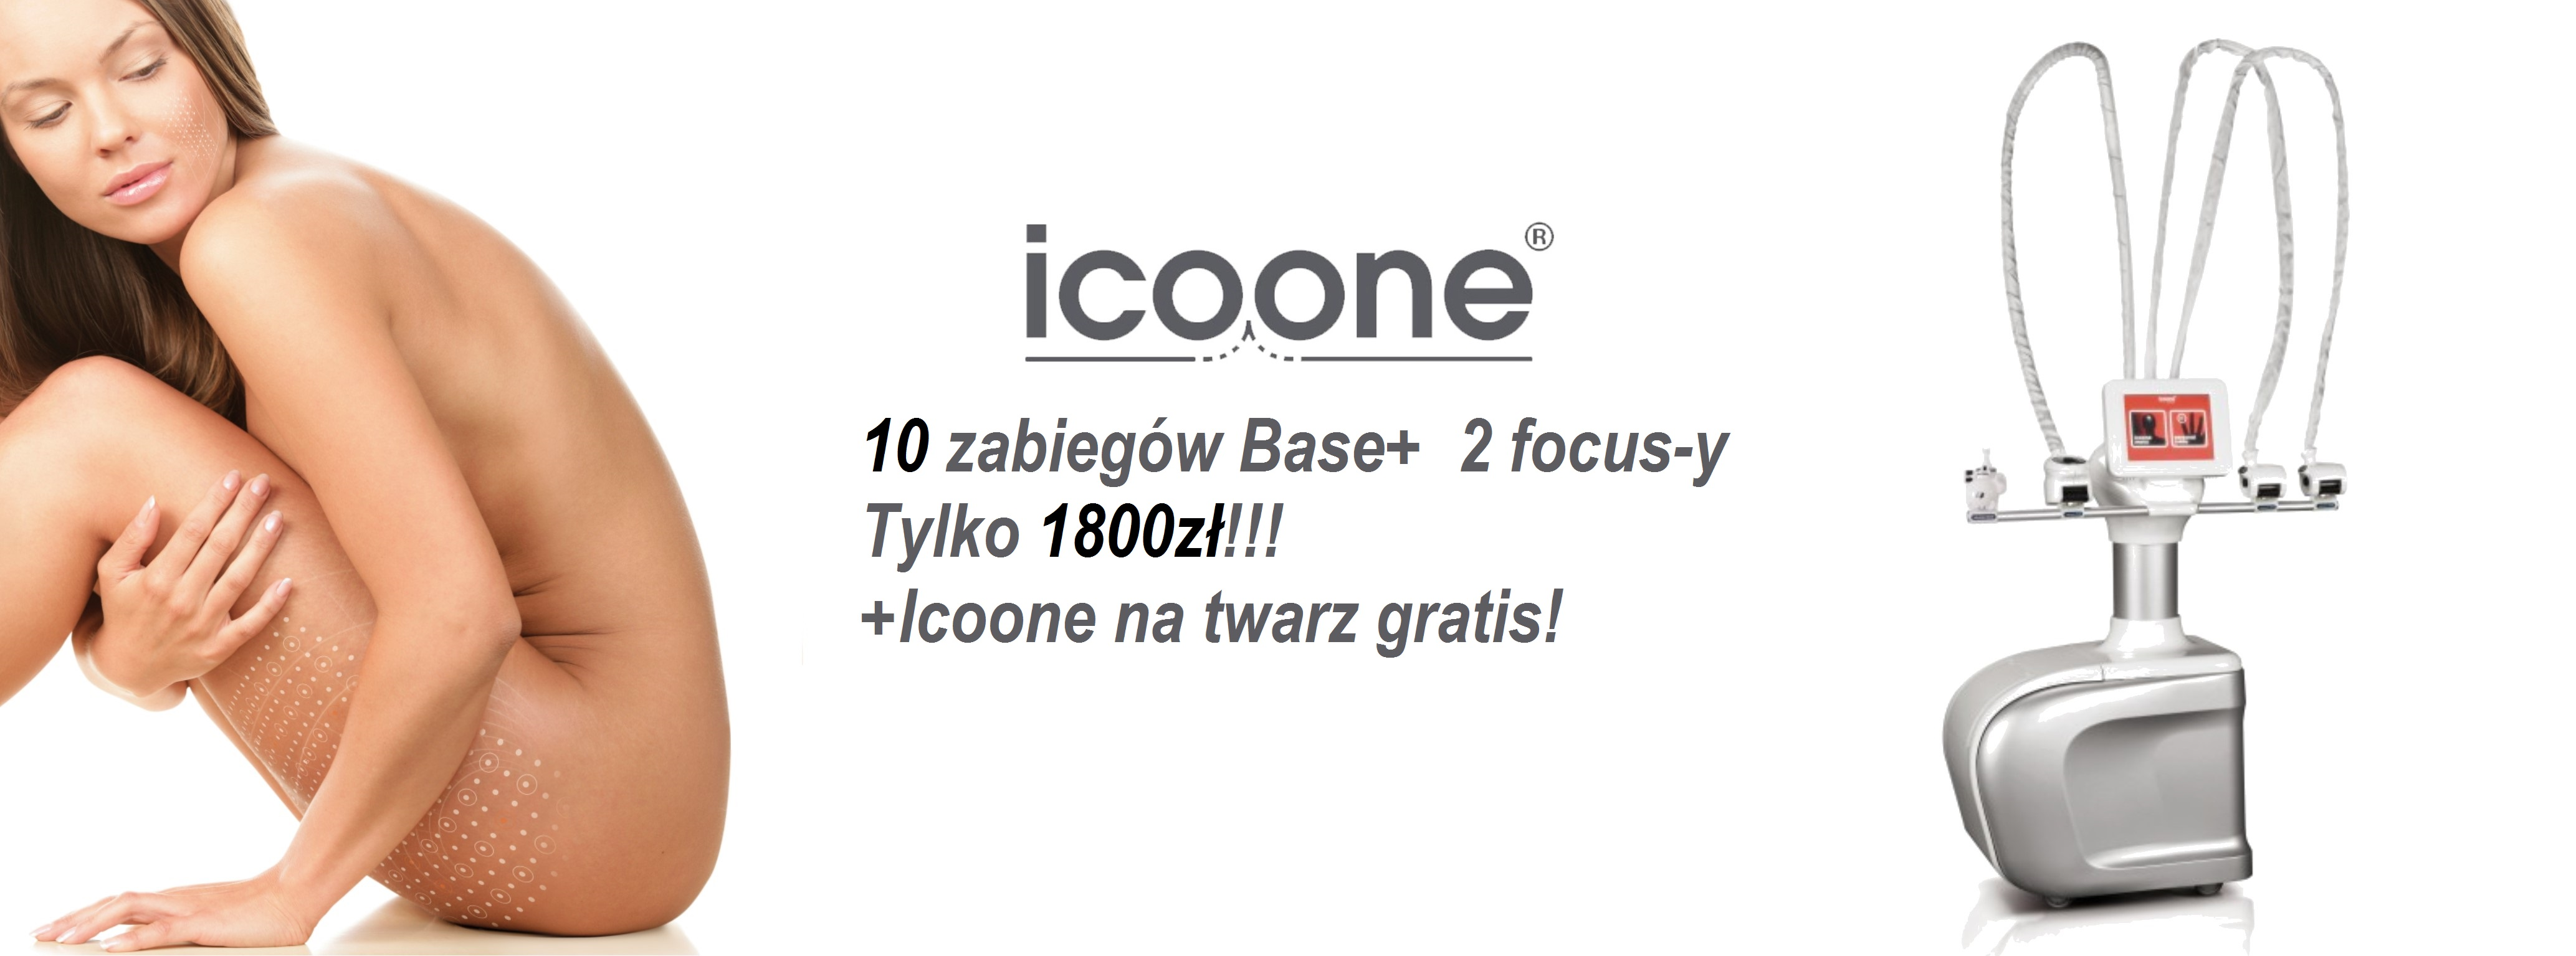 Icoone Wroclaw promocja